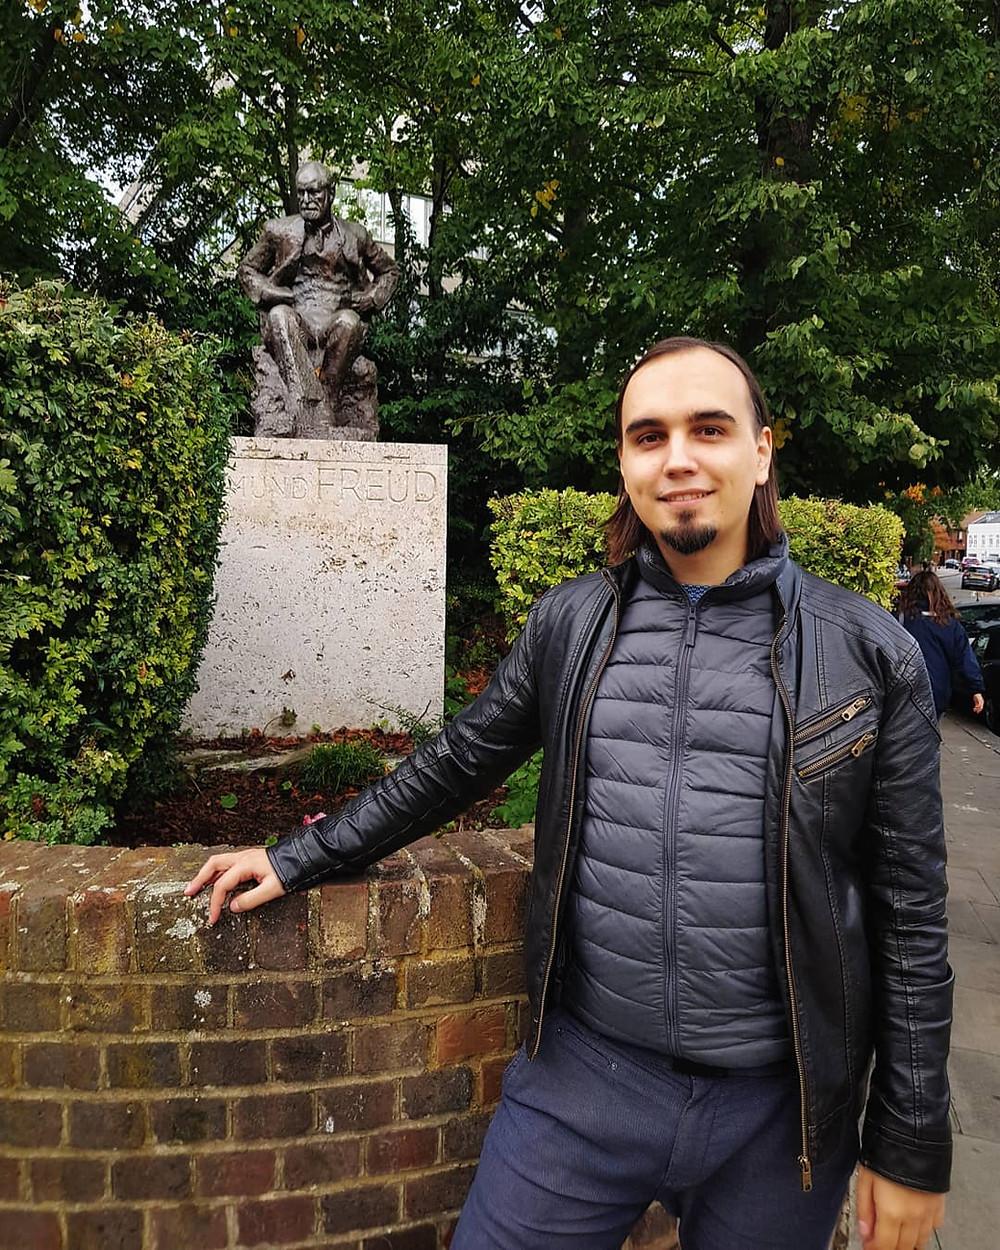 Евгений Пустошкин у памятника Зигмунду Фрейду в Лондоне